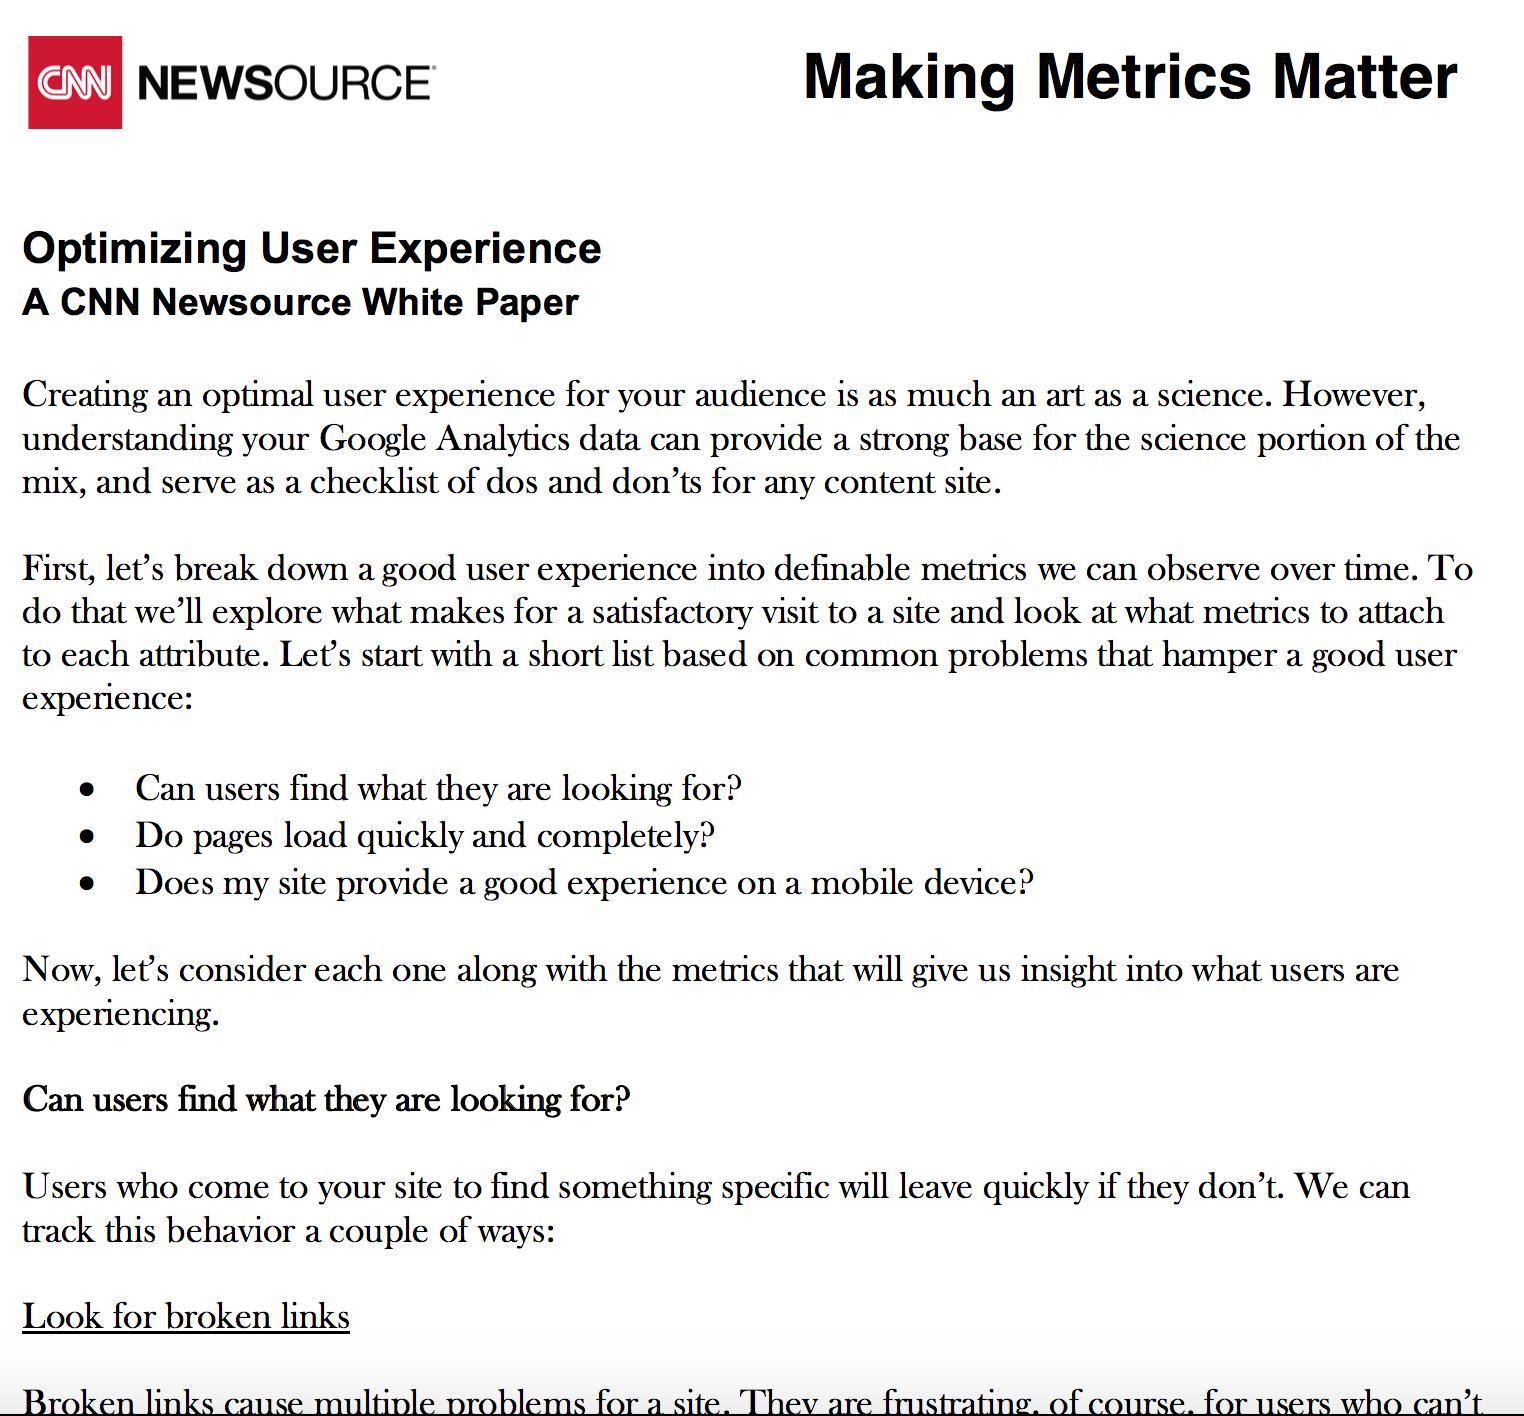 Optimizing User Experience